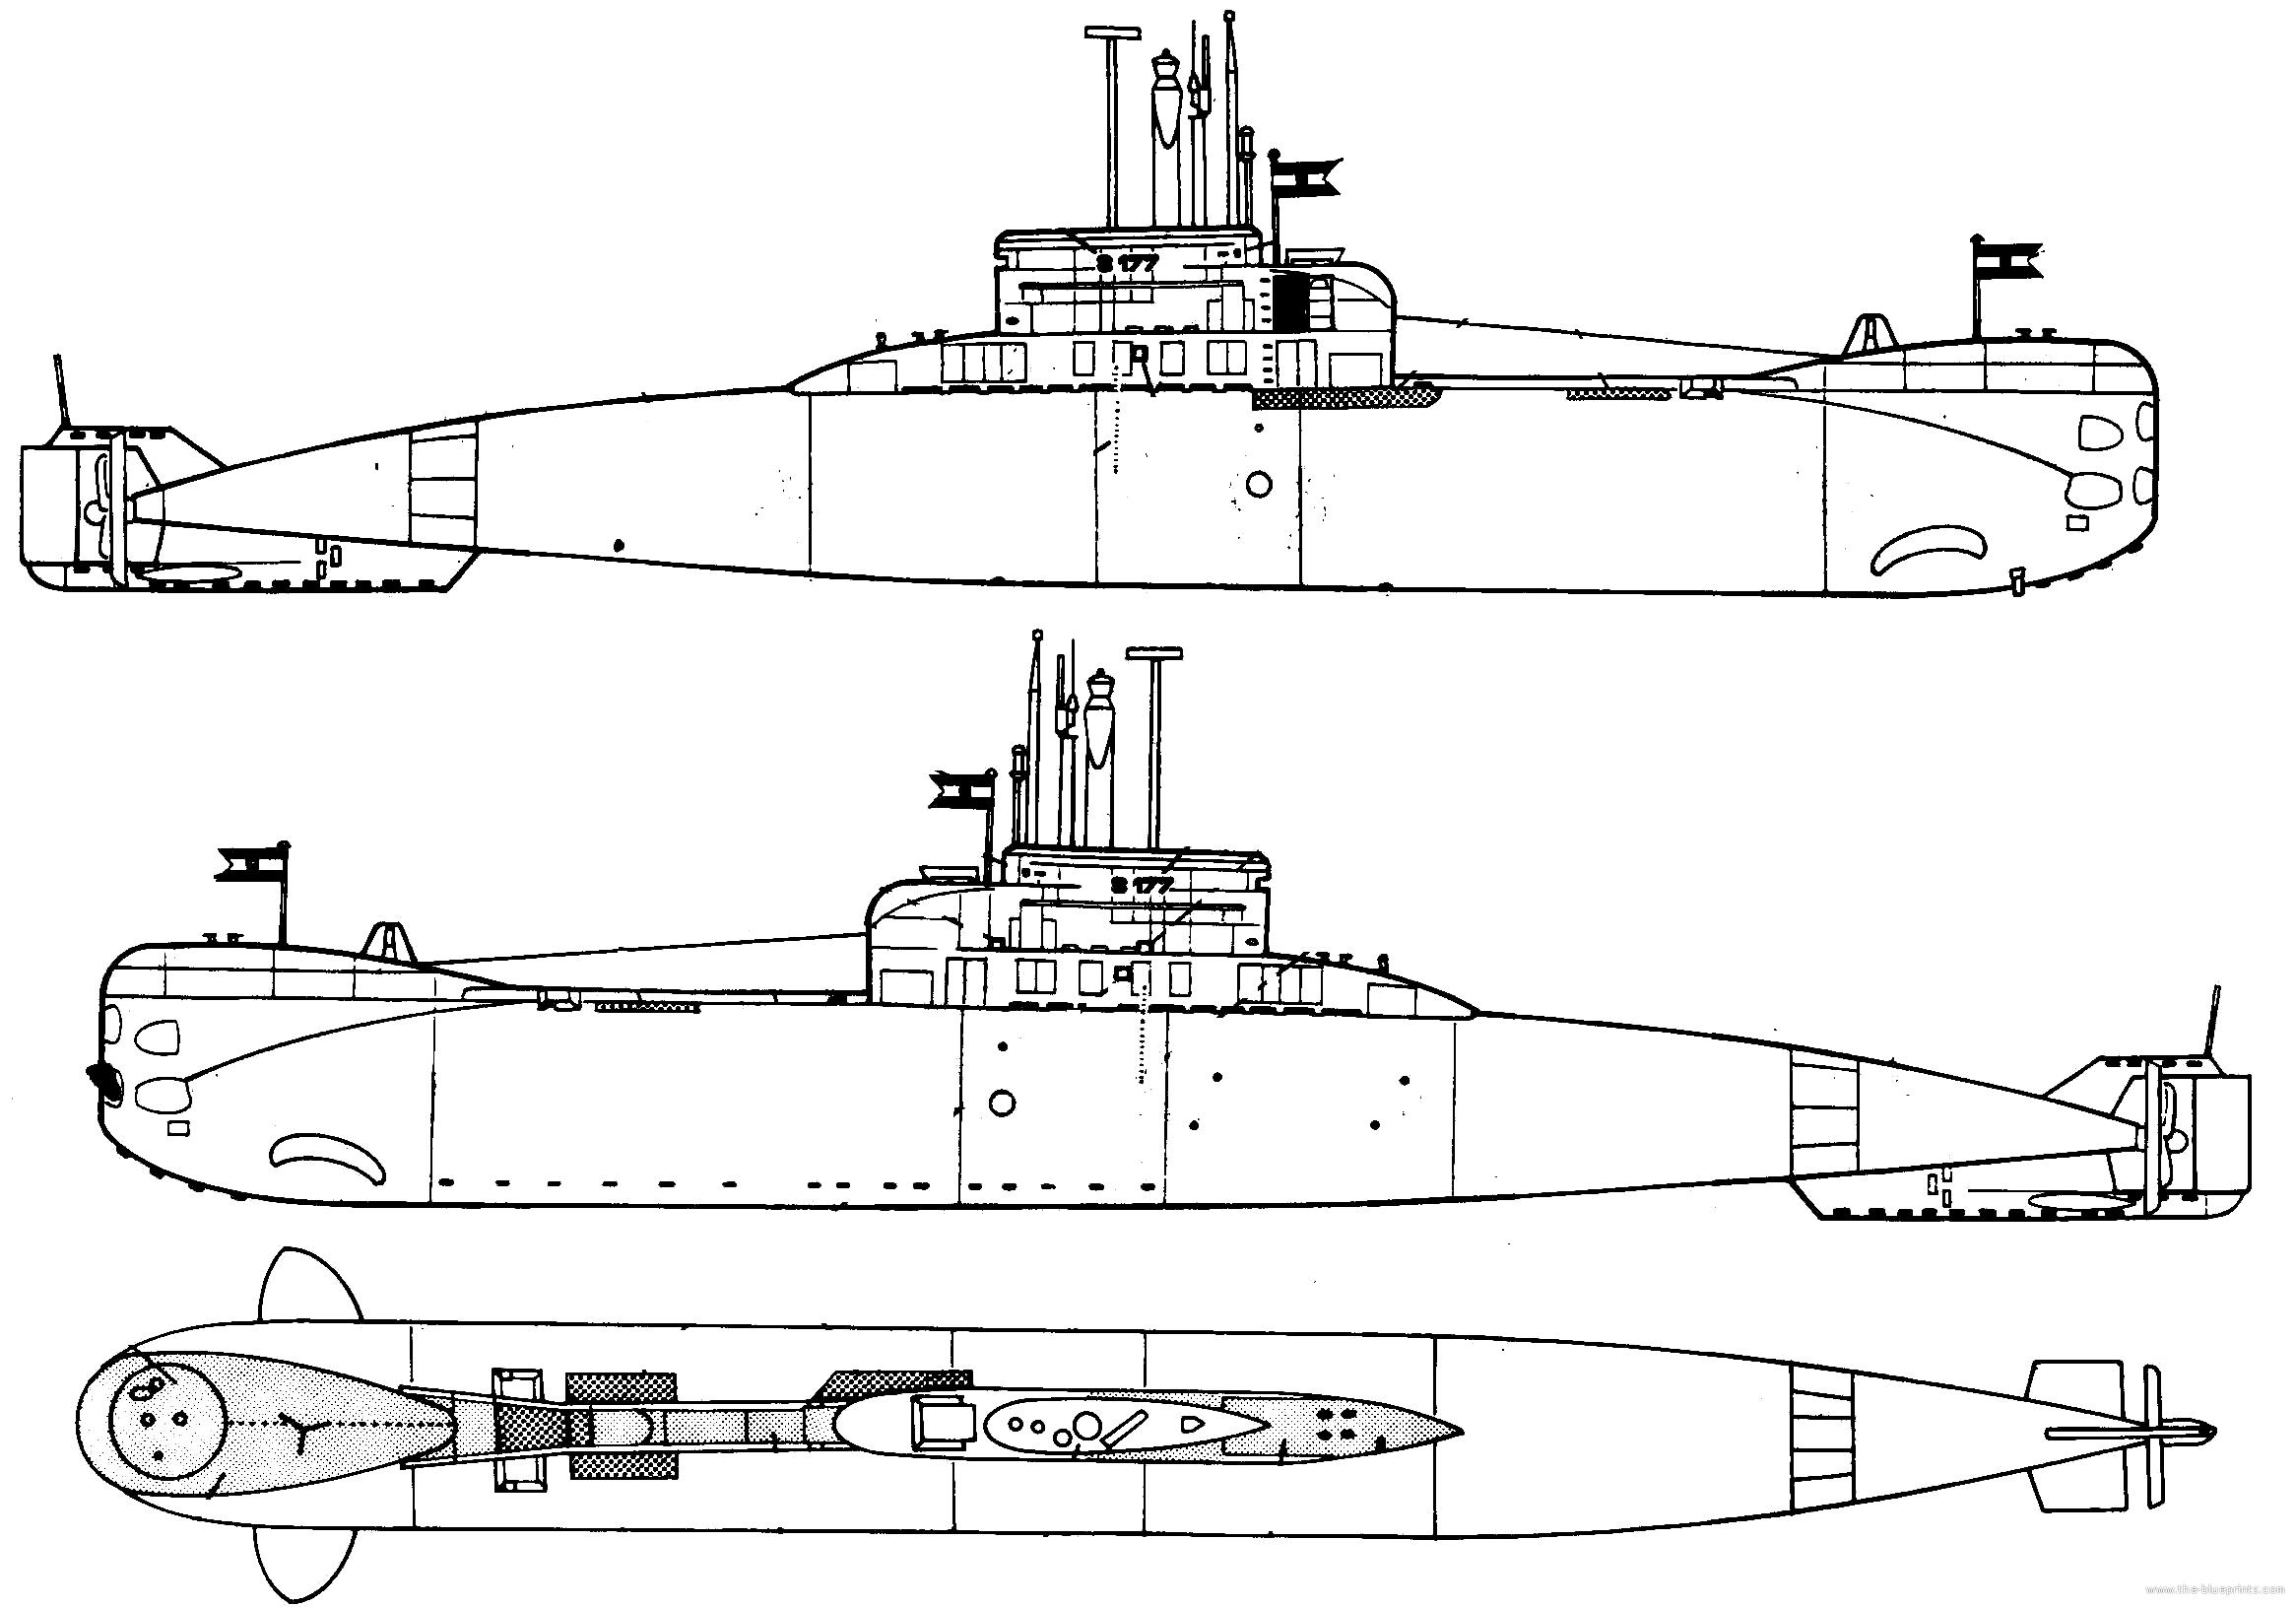 Blueprints > Ships > Submarines (Germany) > DKM U-Boat ...